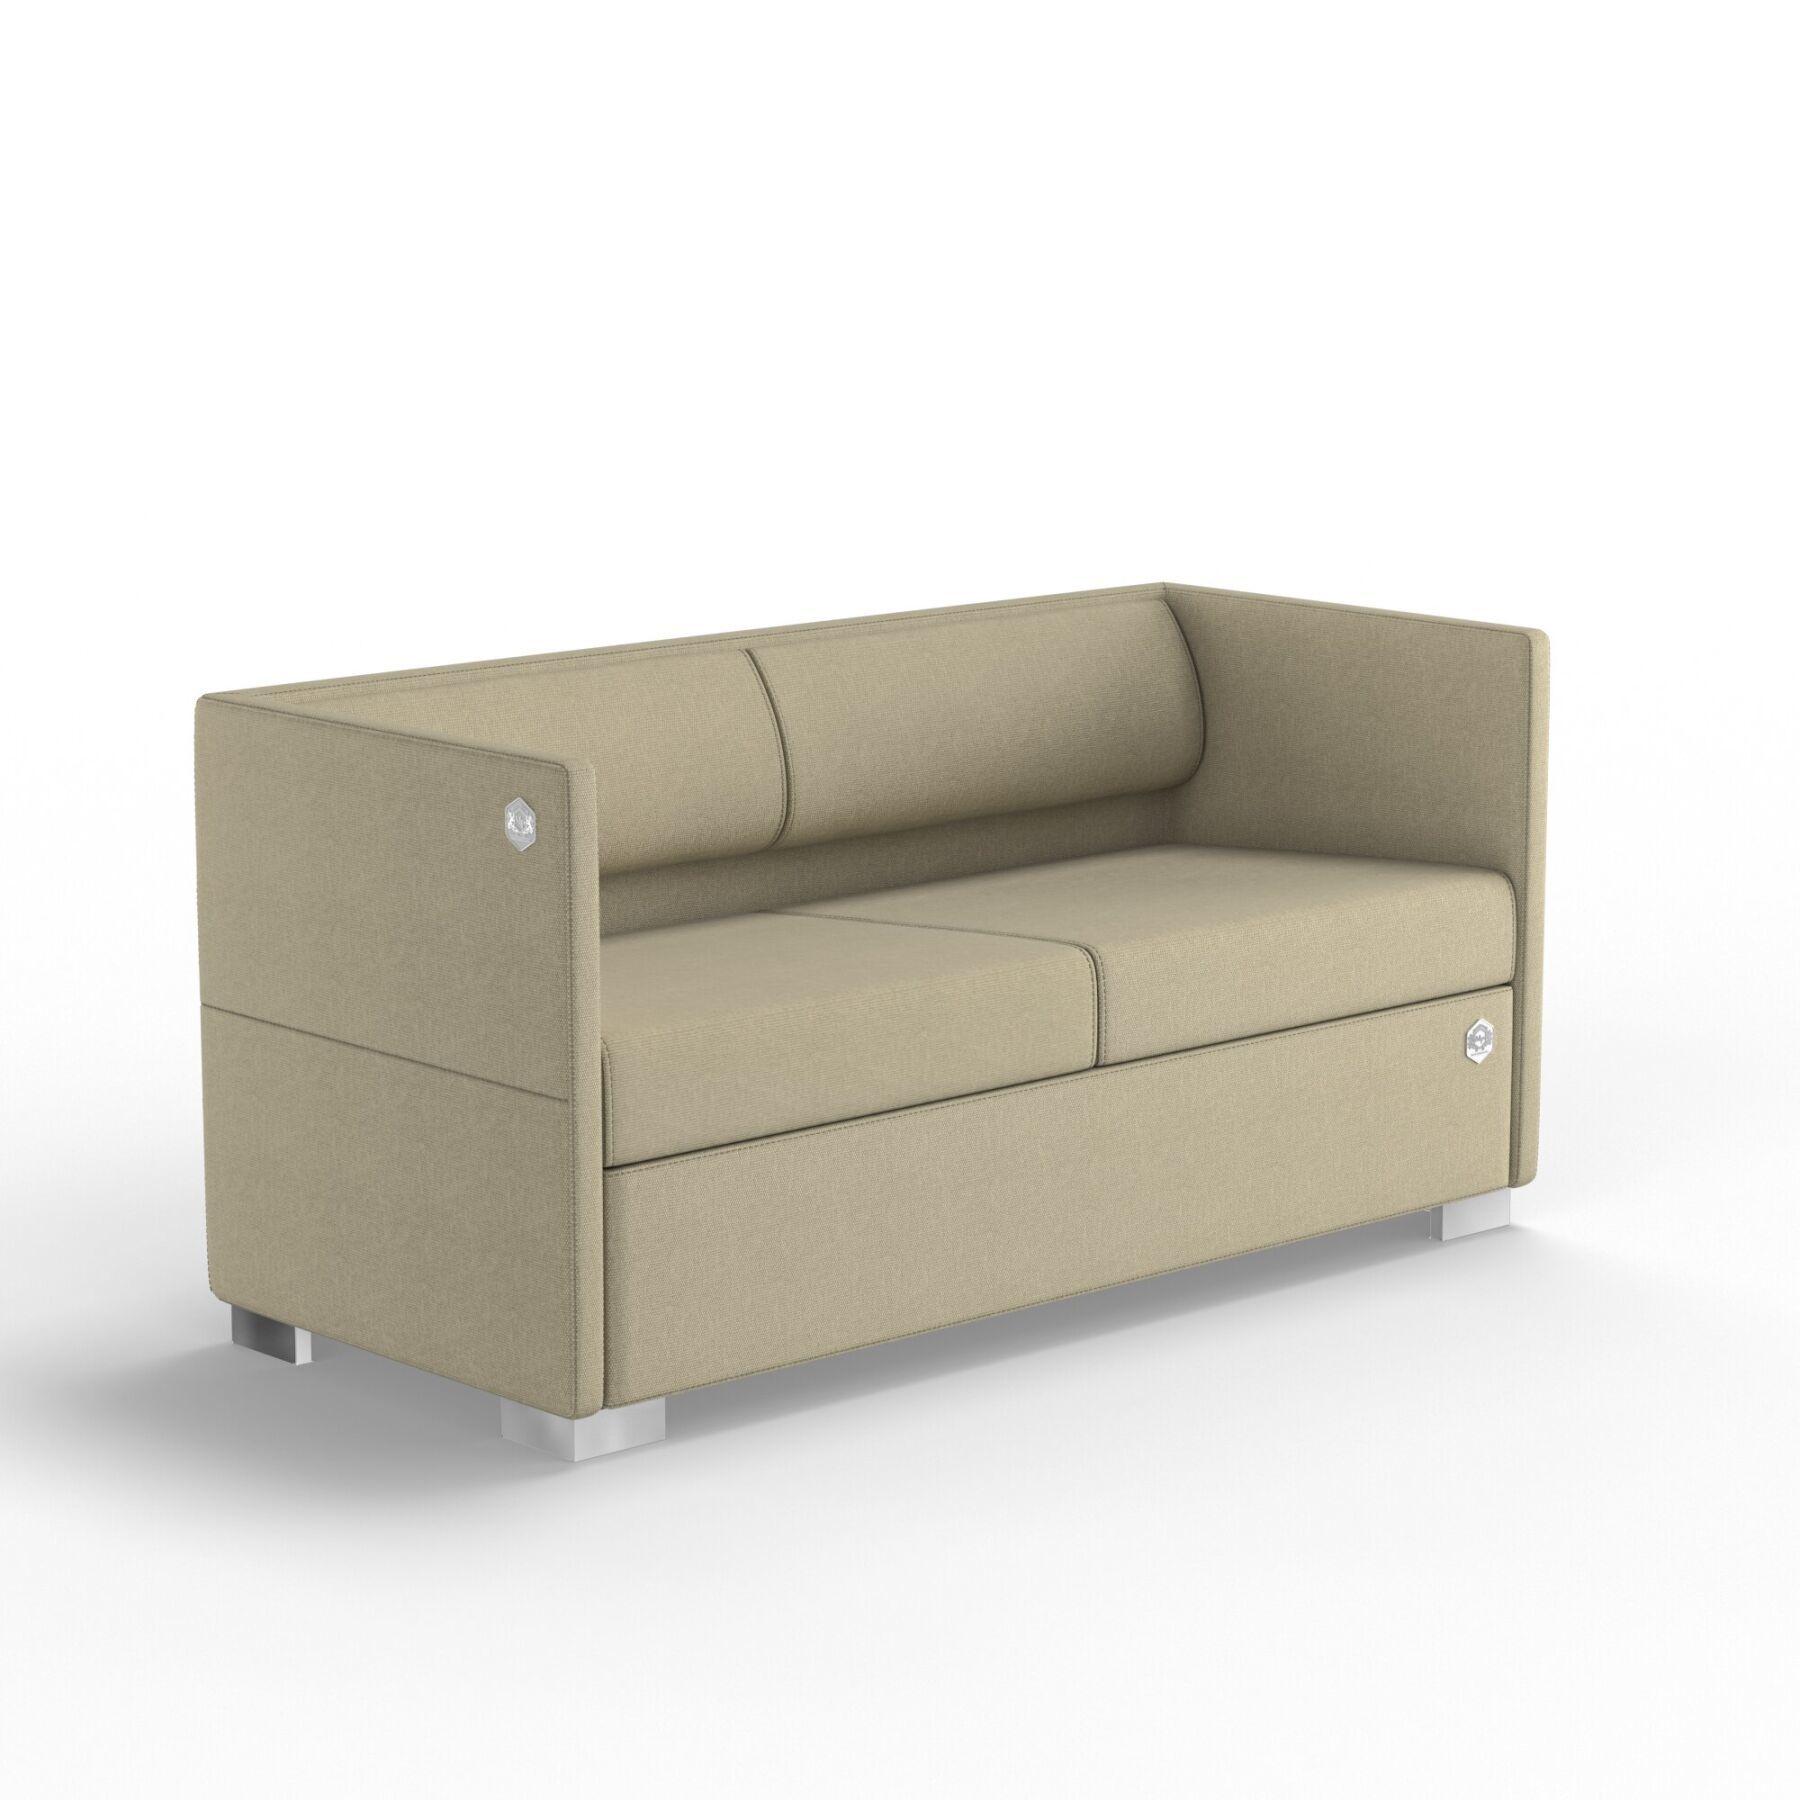 Двухместный диван KULIK SYSTEM LOUNGE Ткань 2